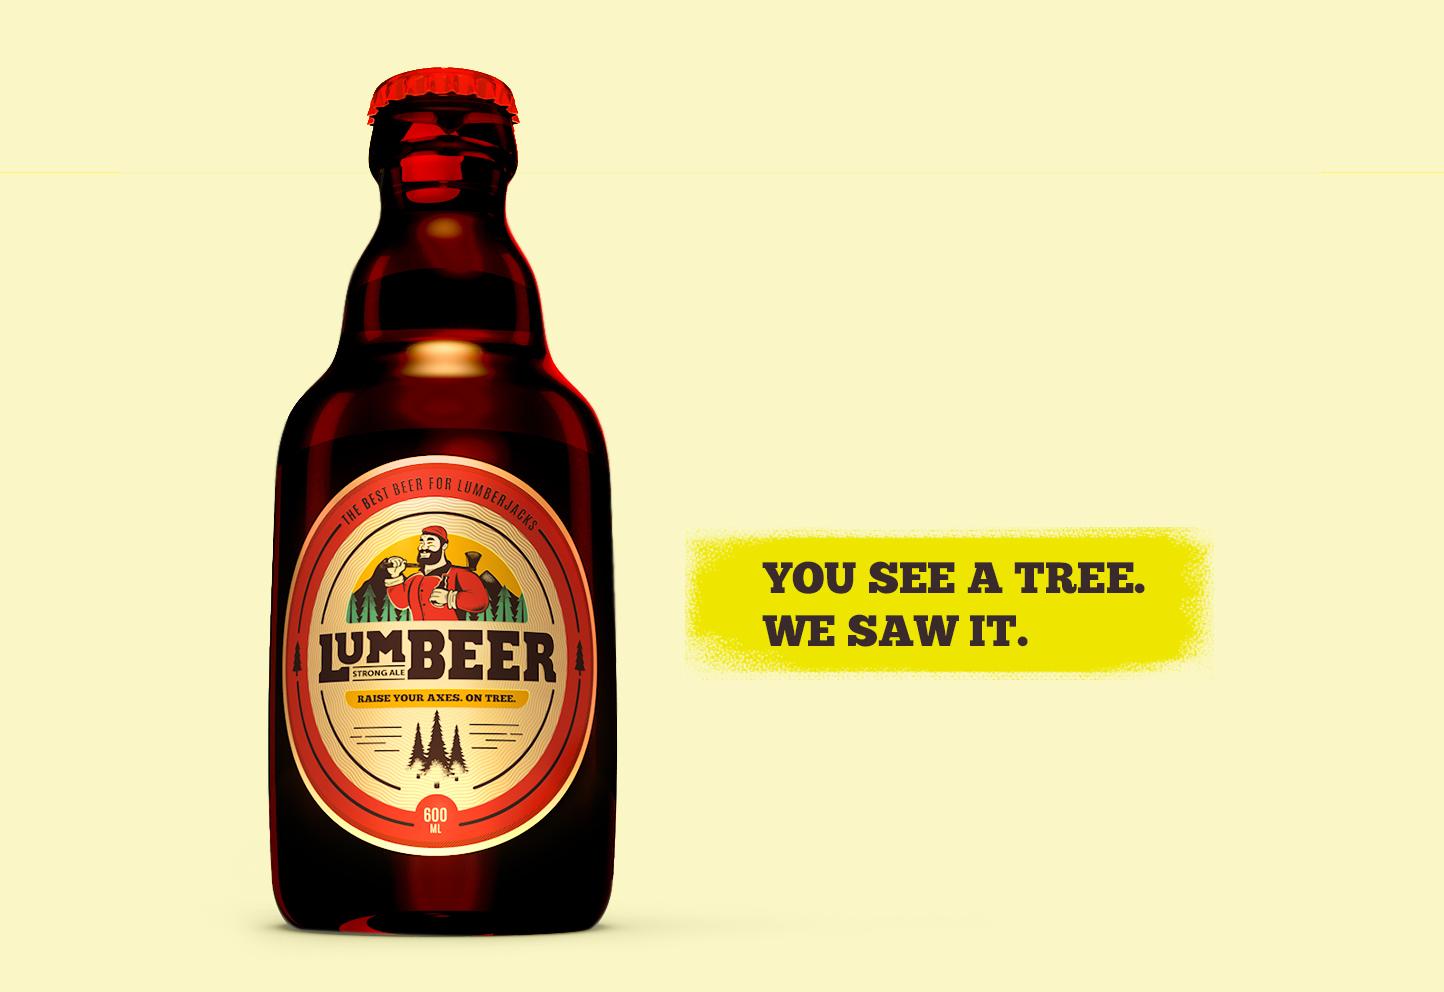 LumBeer_bottle_2